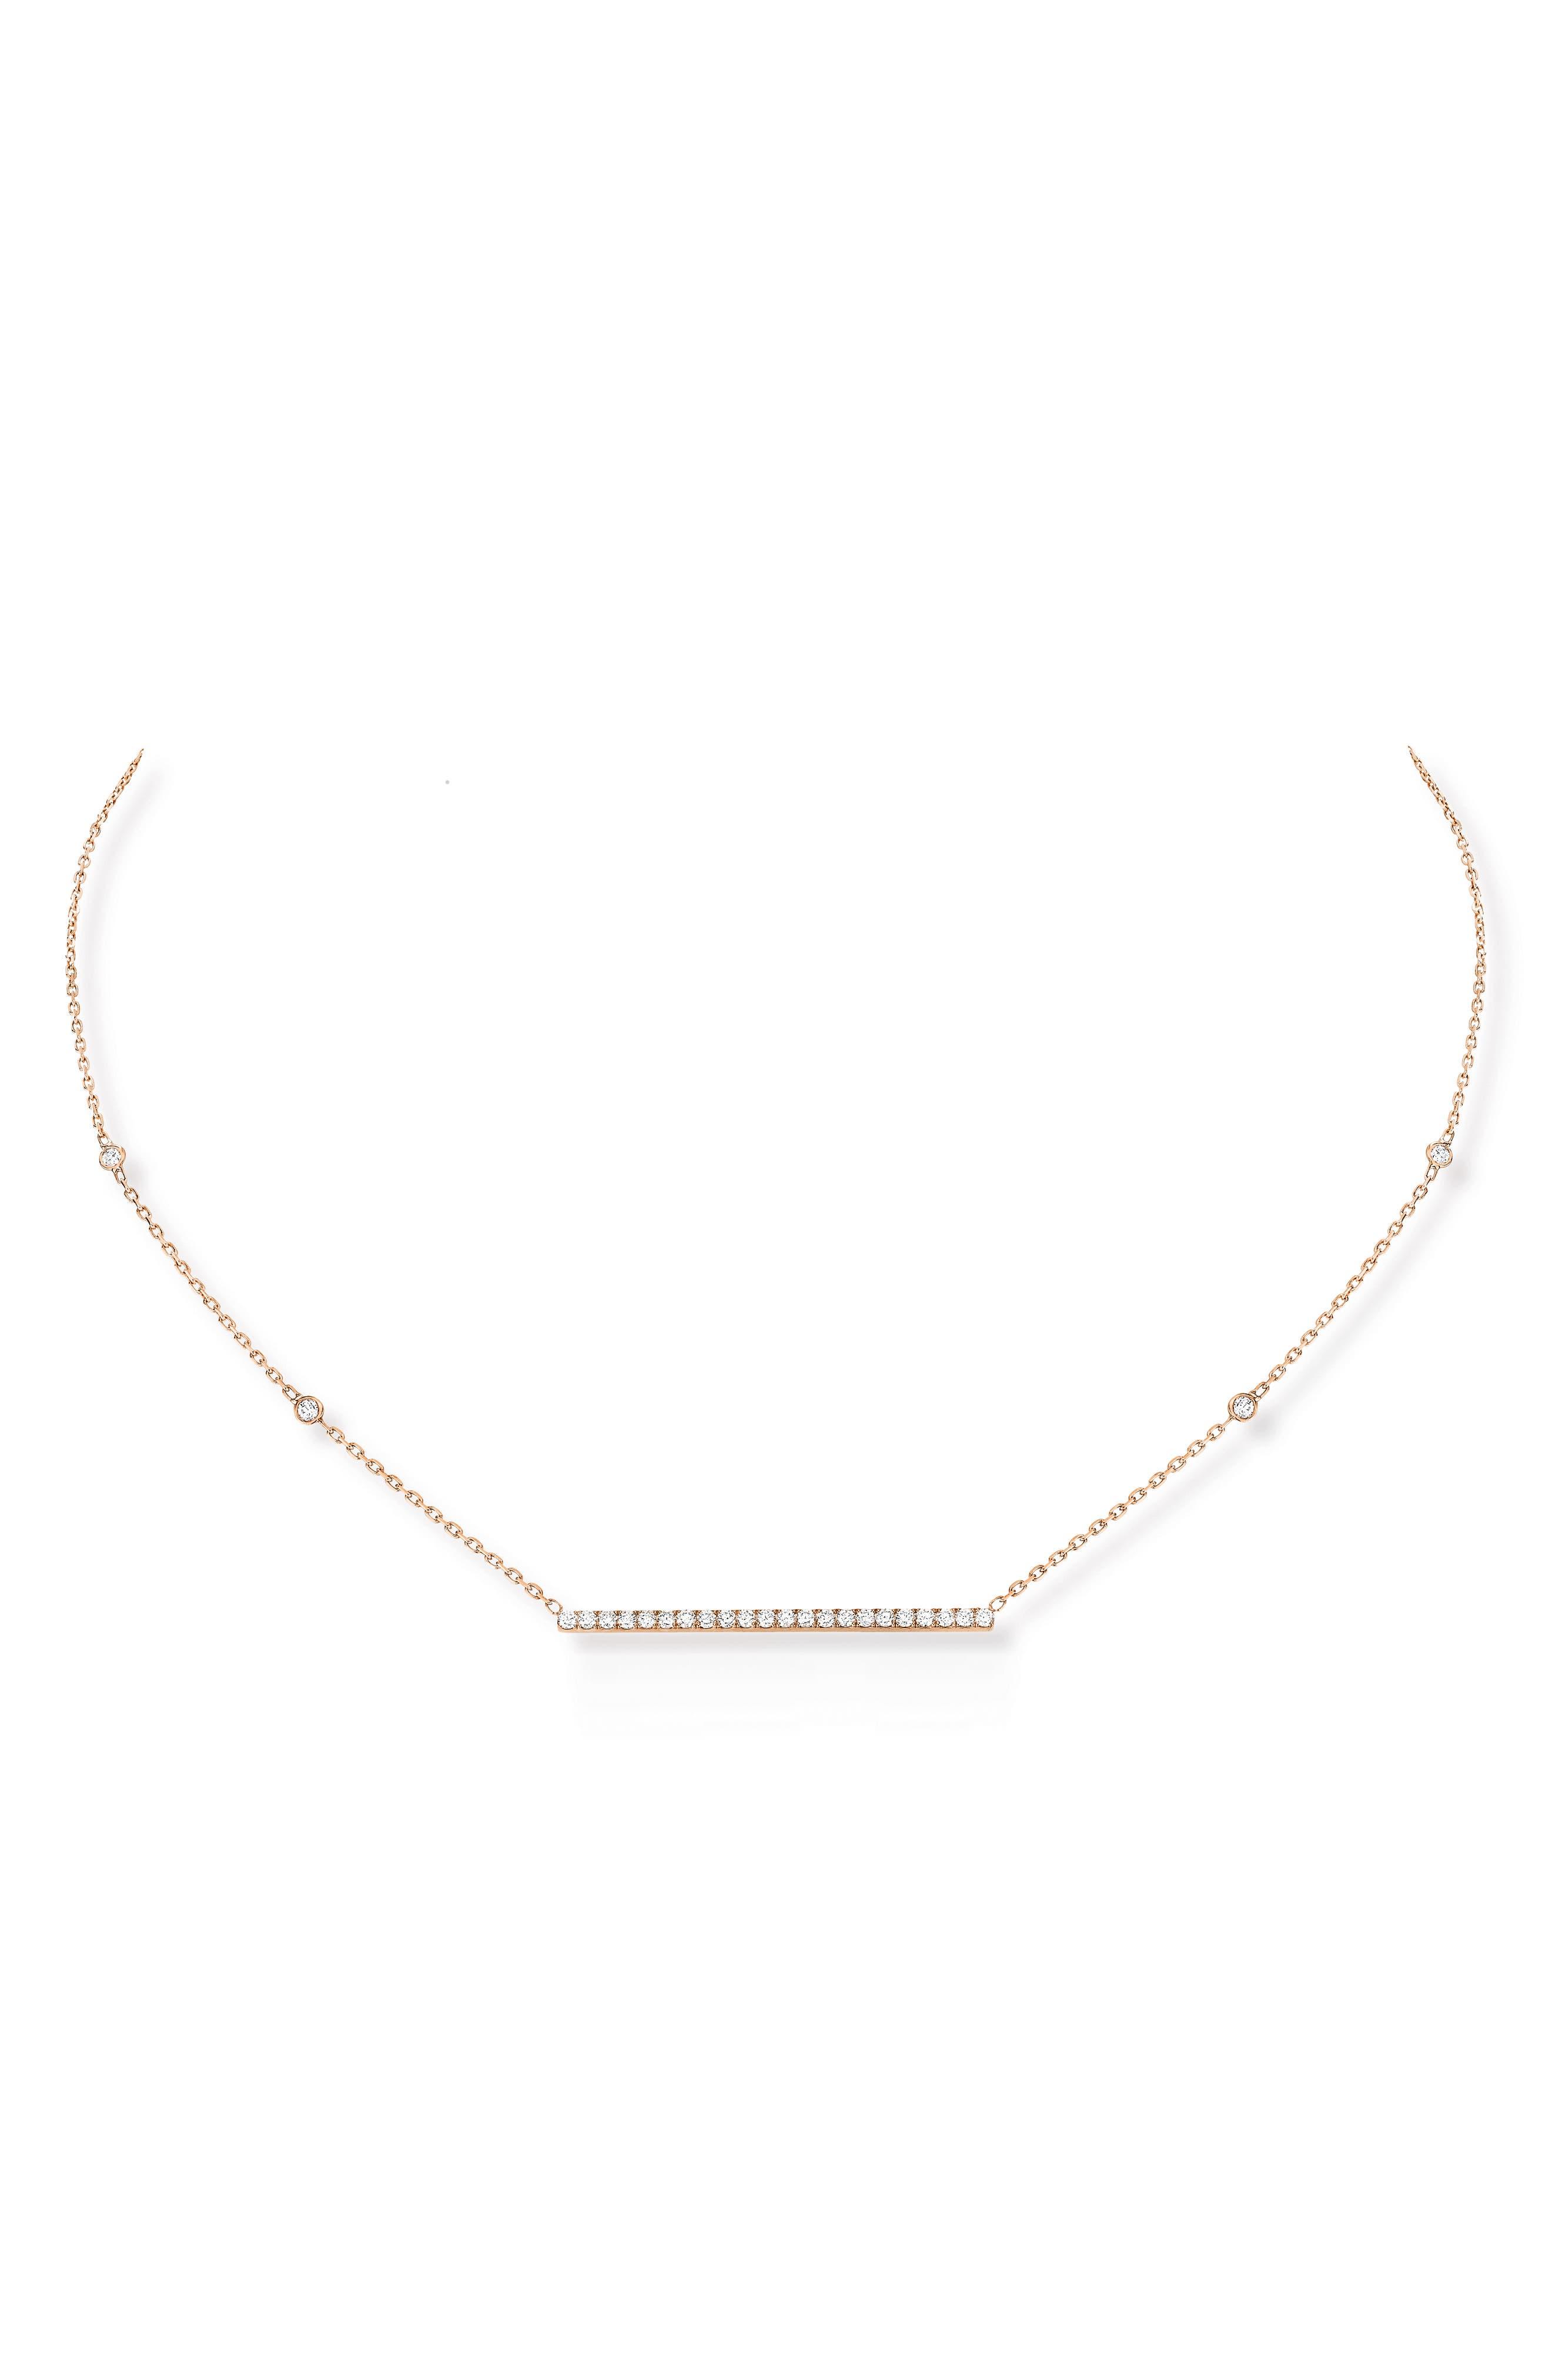 Gatsby Diamond Bar Necklace,                             Main thumbnail 1, color,                             ROSE GOLD